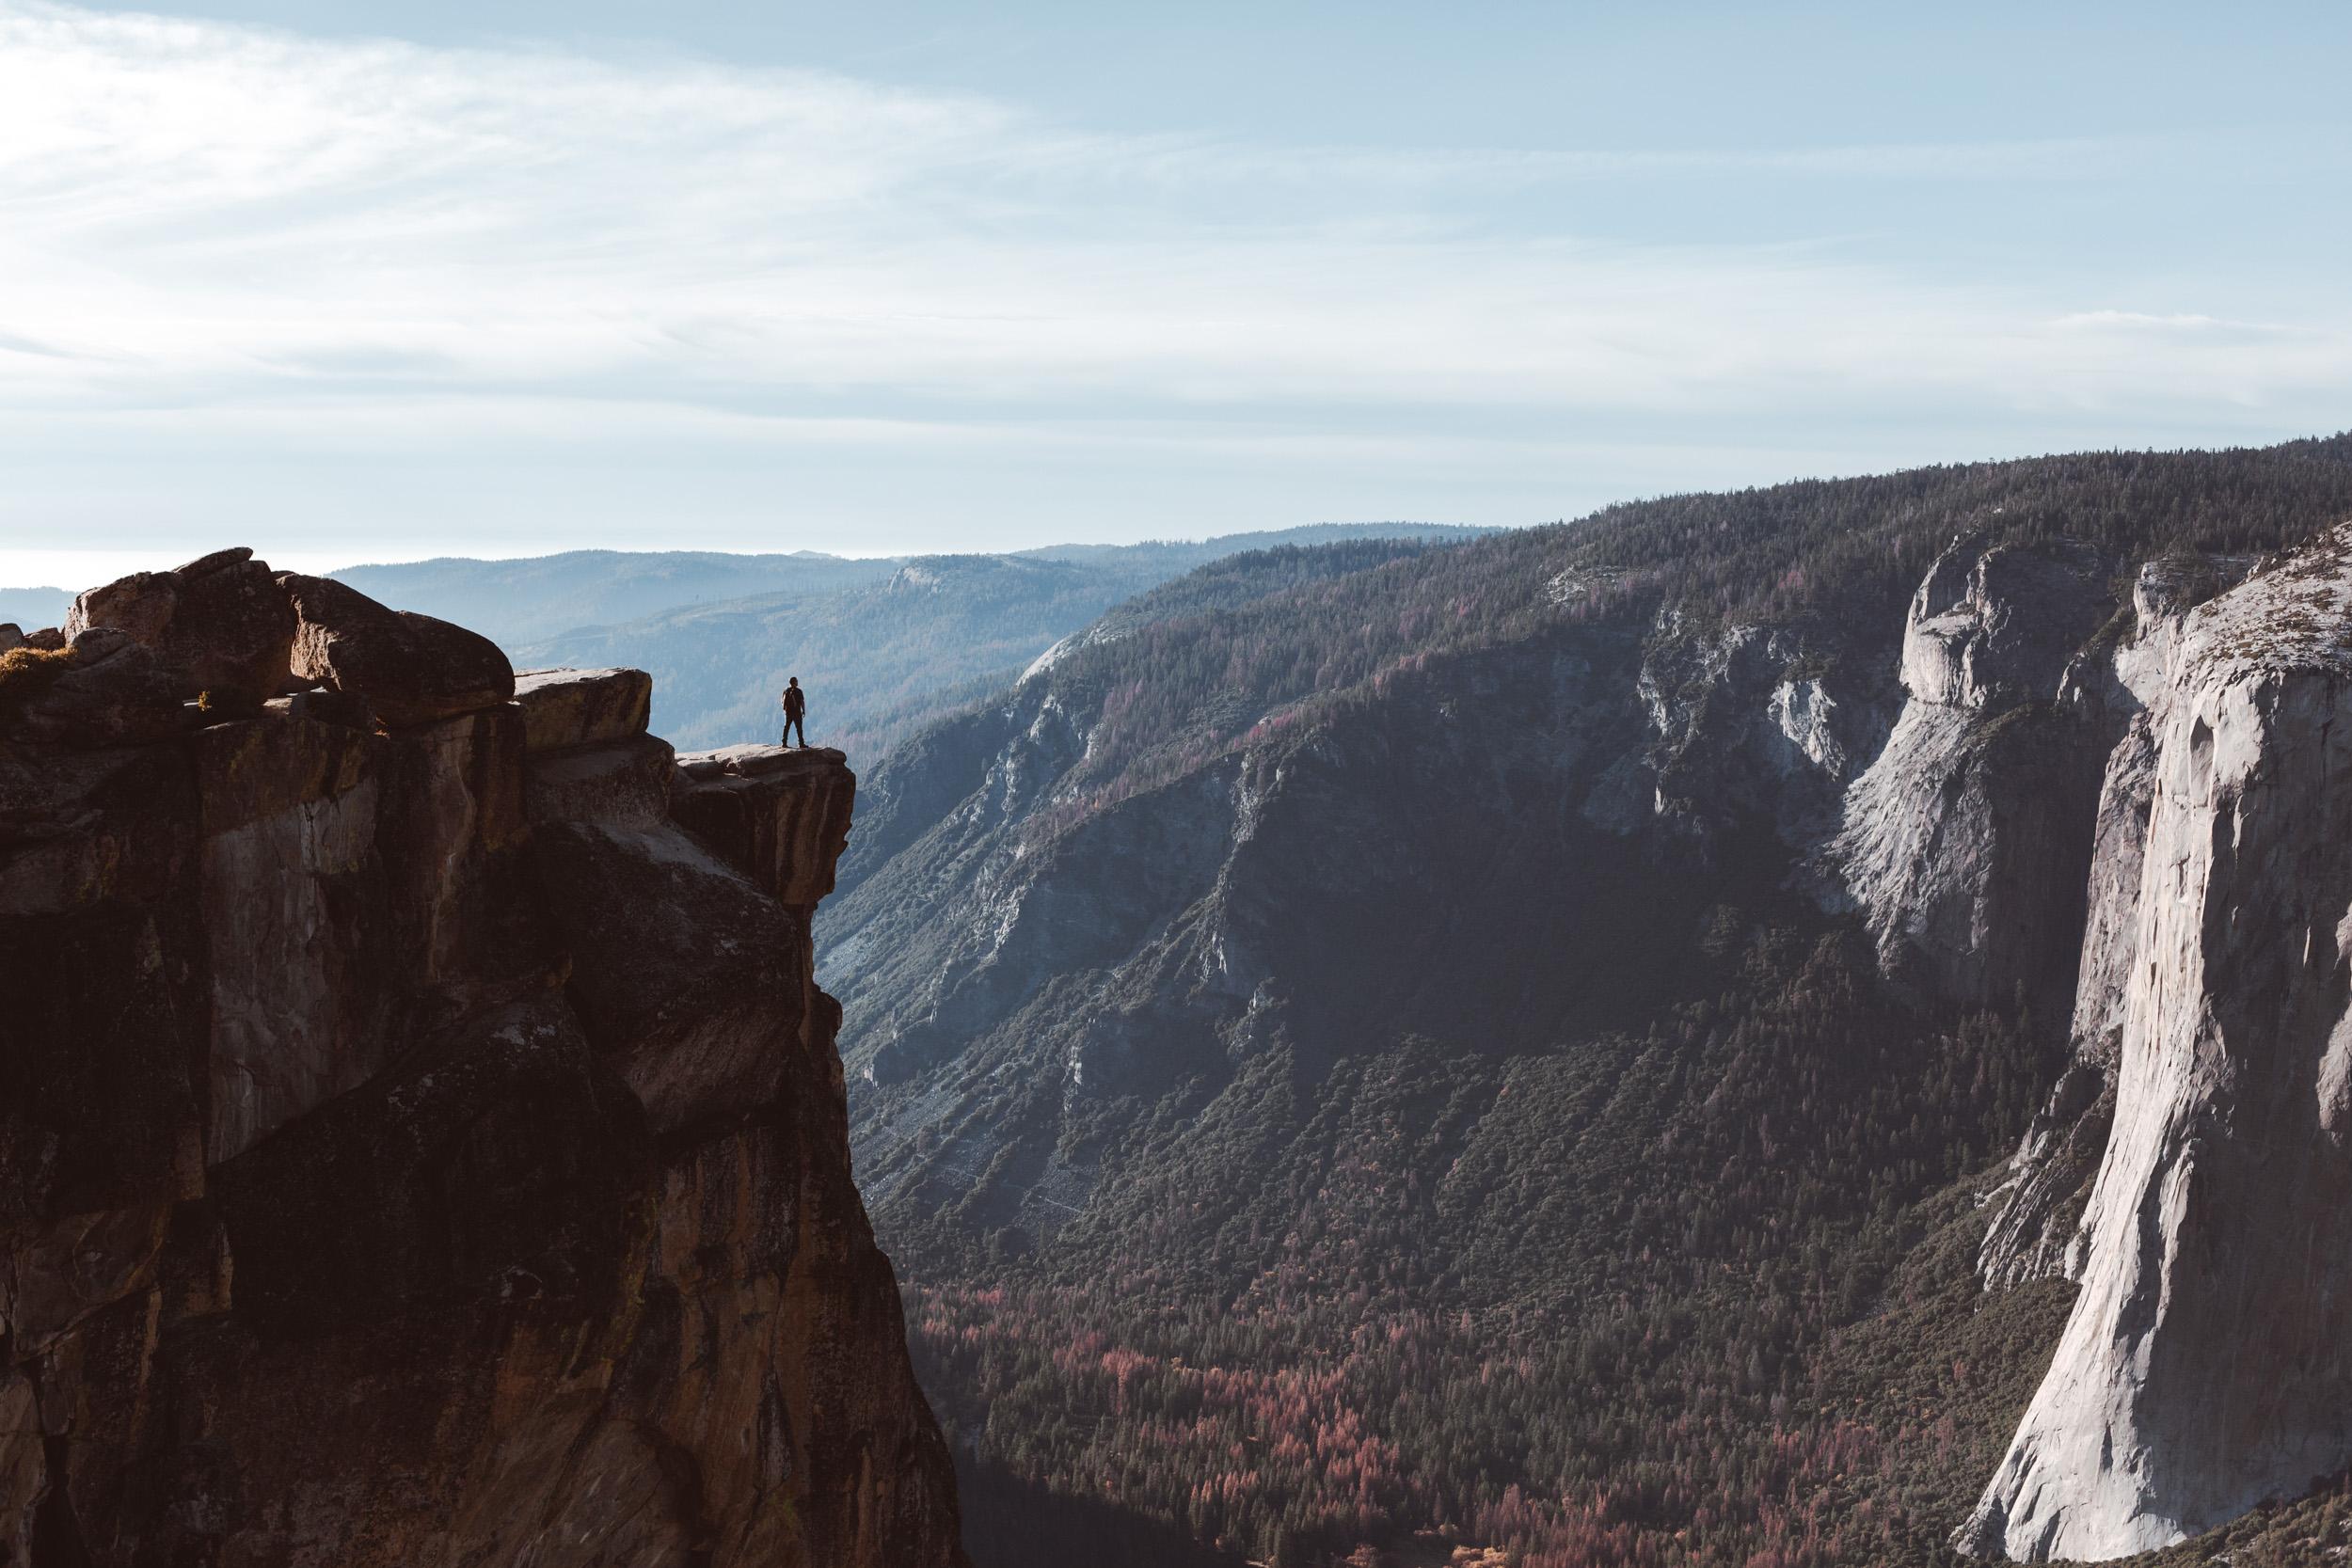 yosemite-taft-point-views-hike-and-shoot-1.jpg